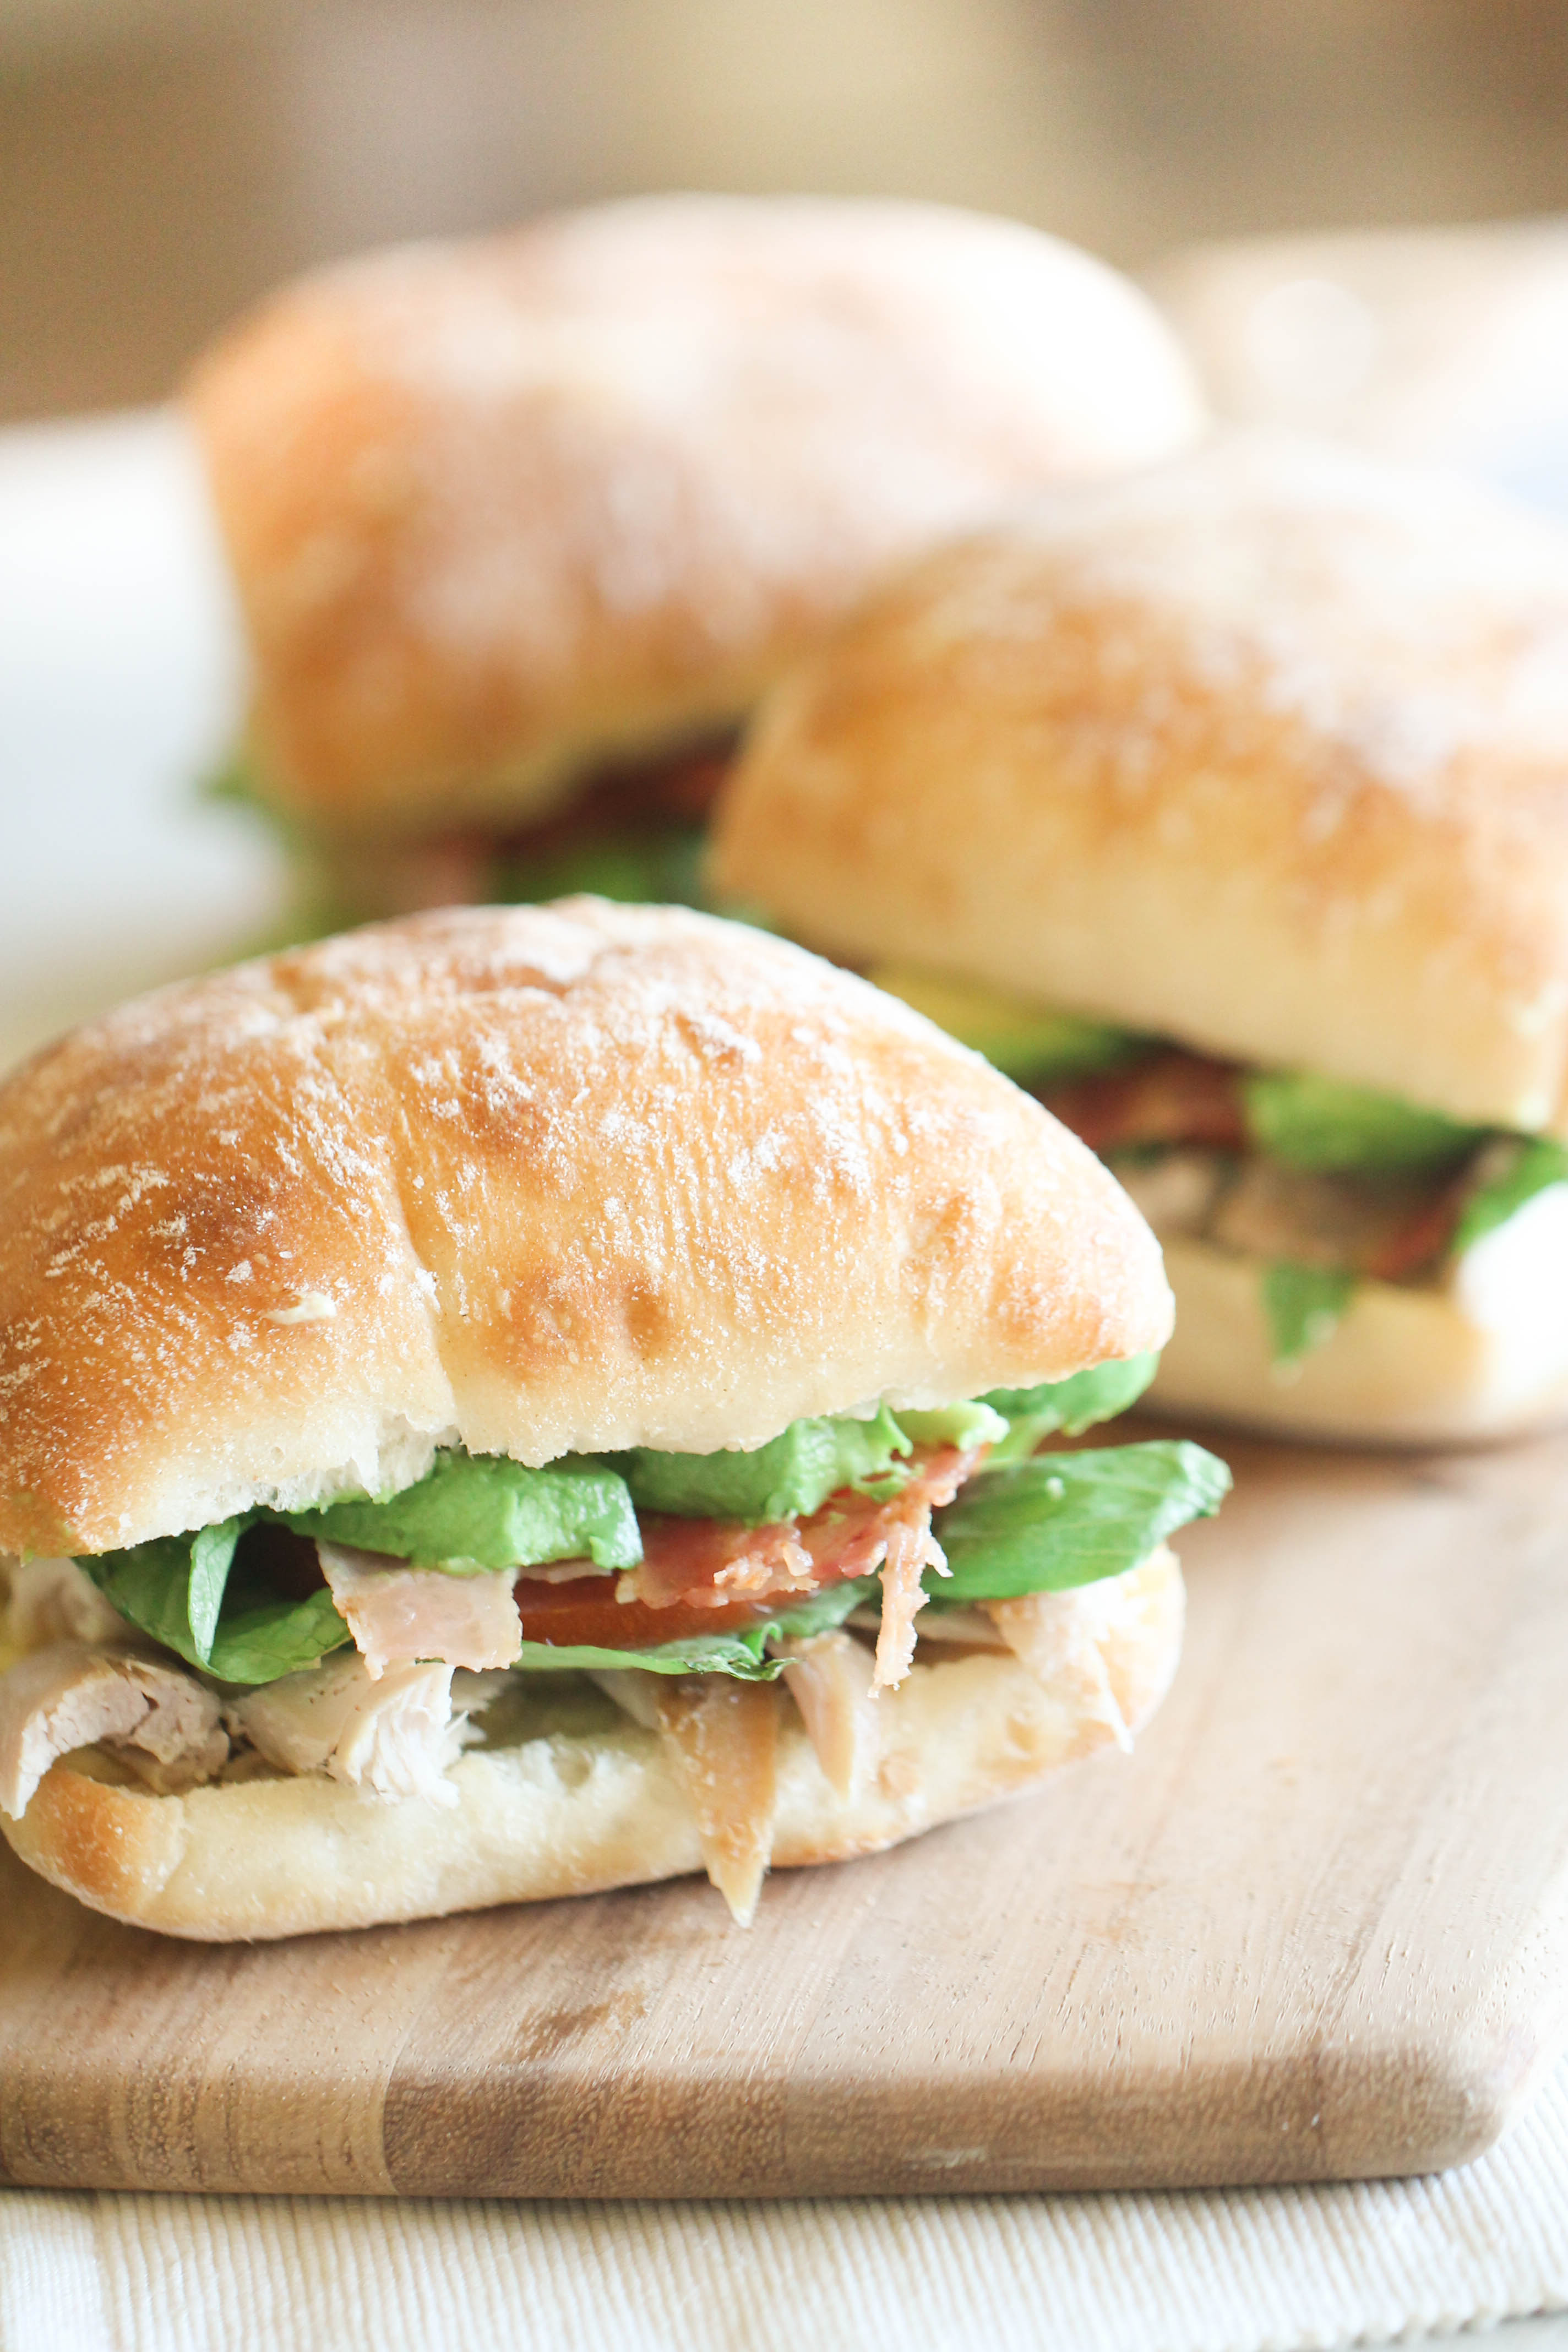 Kneader's Chicken Bacon Avocado Sandwich